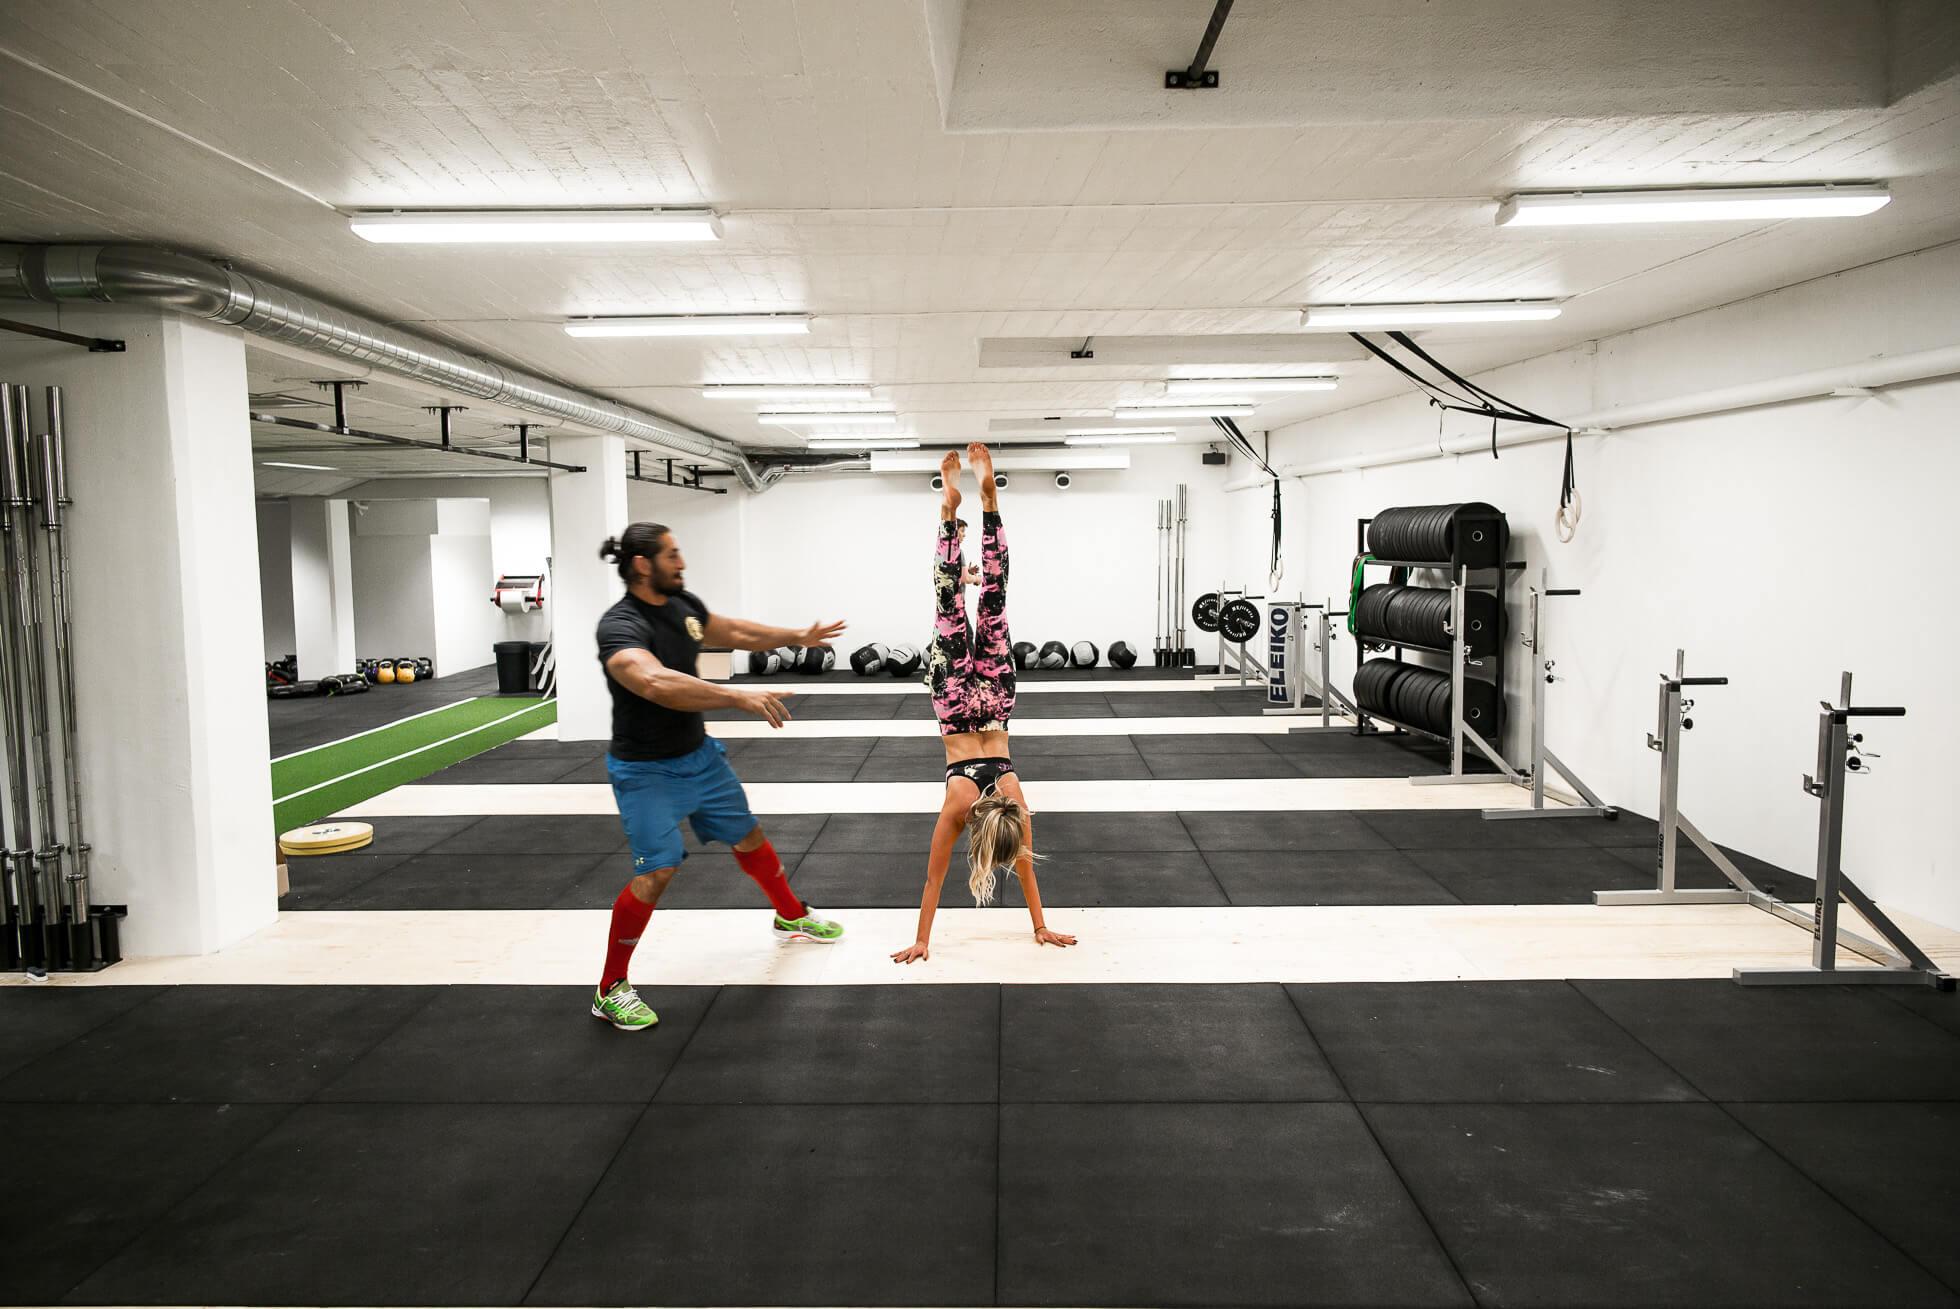 janni-deler-gym-crossfit-atum-stockholmL1000231